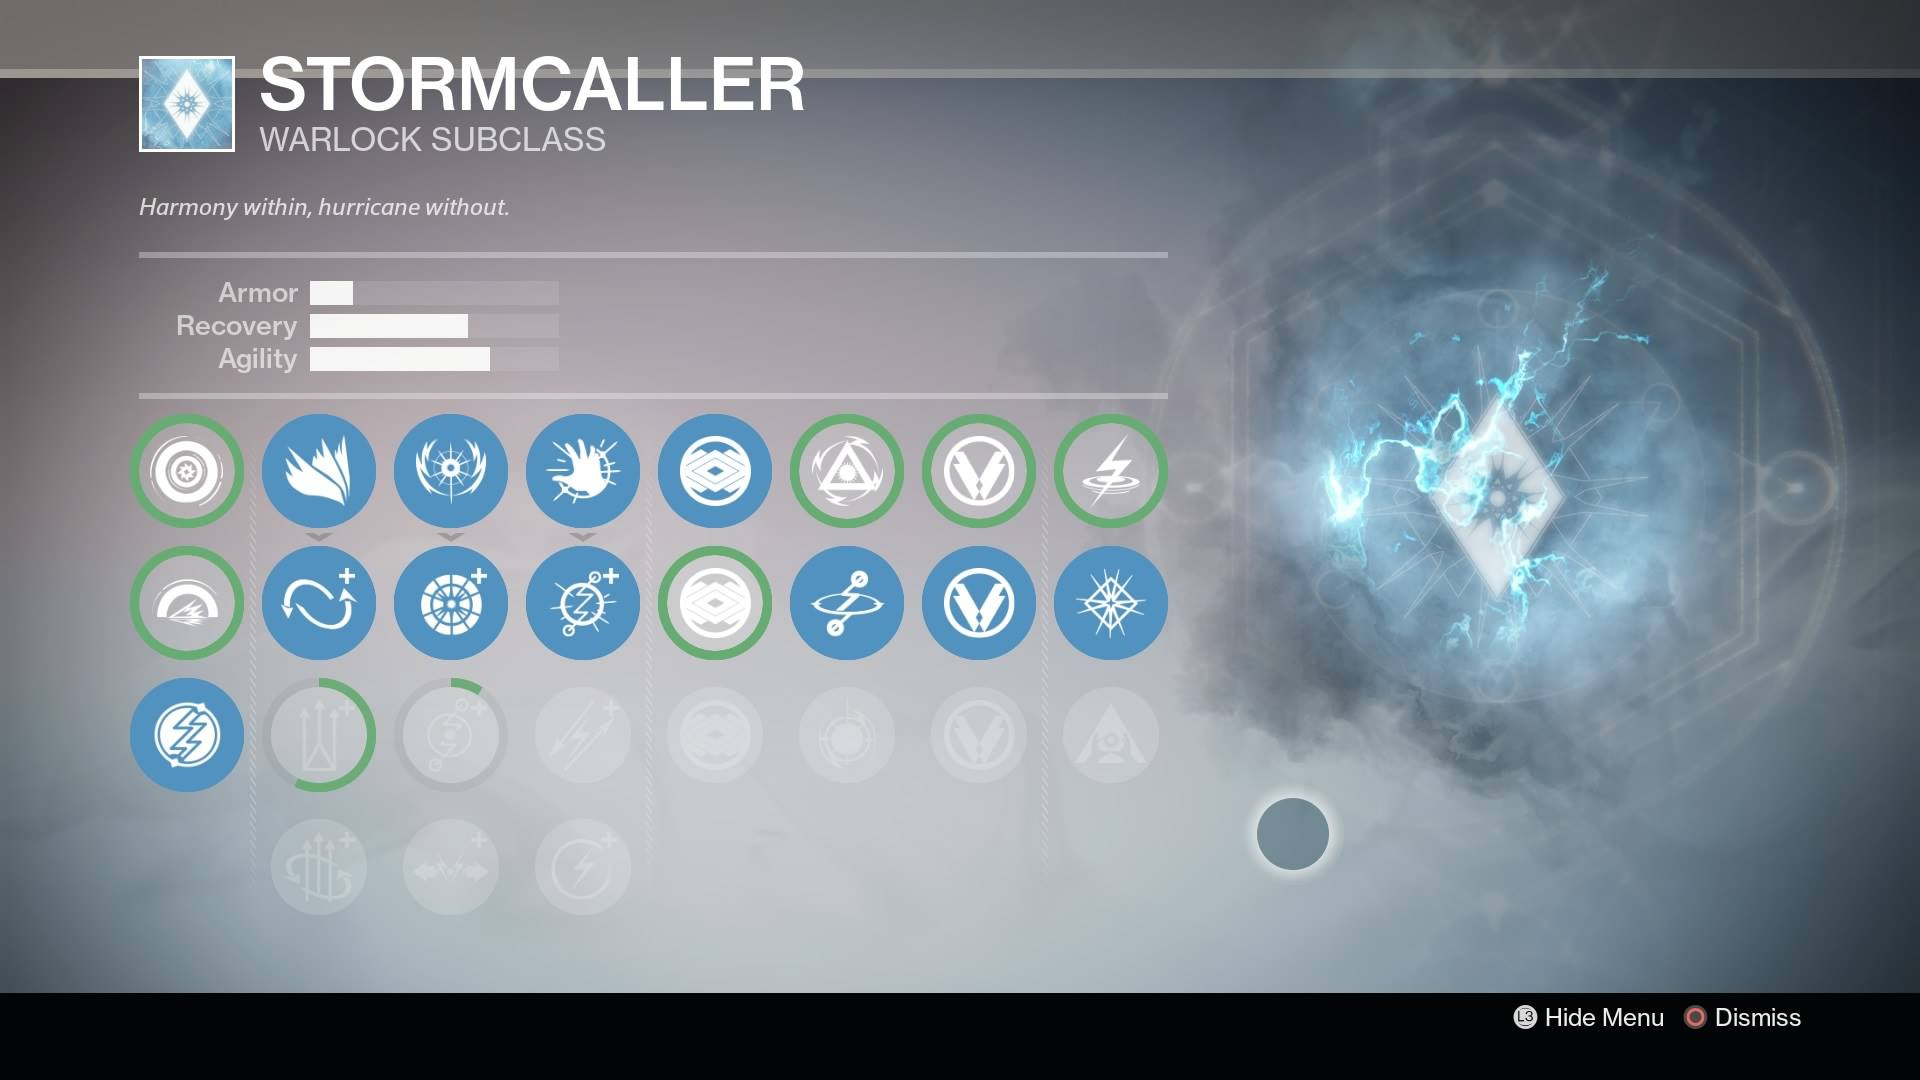 stormcaller_subclass_the_taken_king